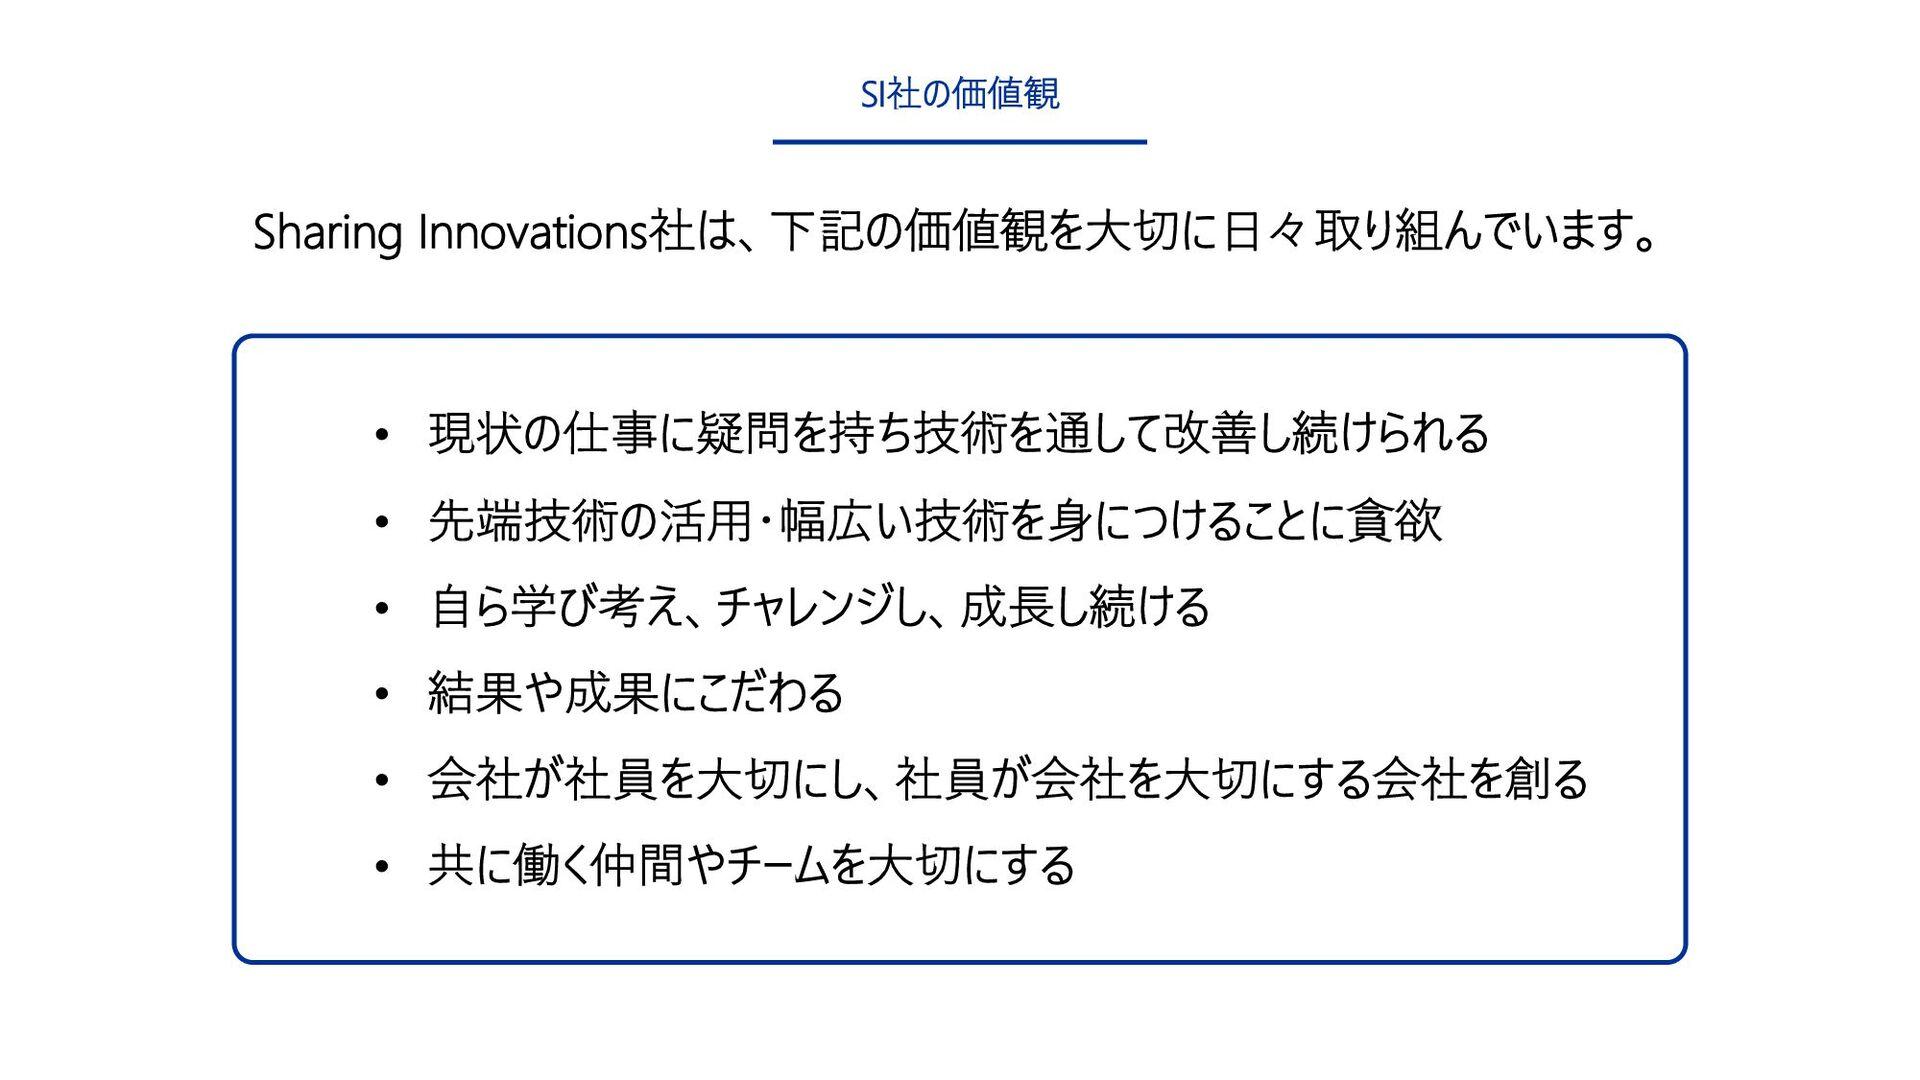 19 SI社の価値観 • 現状の仕事に疑問を持ち技術を通して改善し続けられる • 先端技術の活...